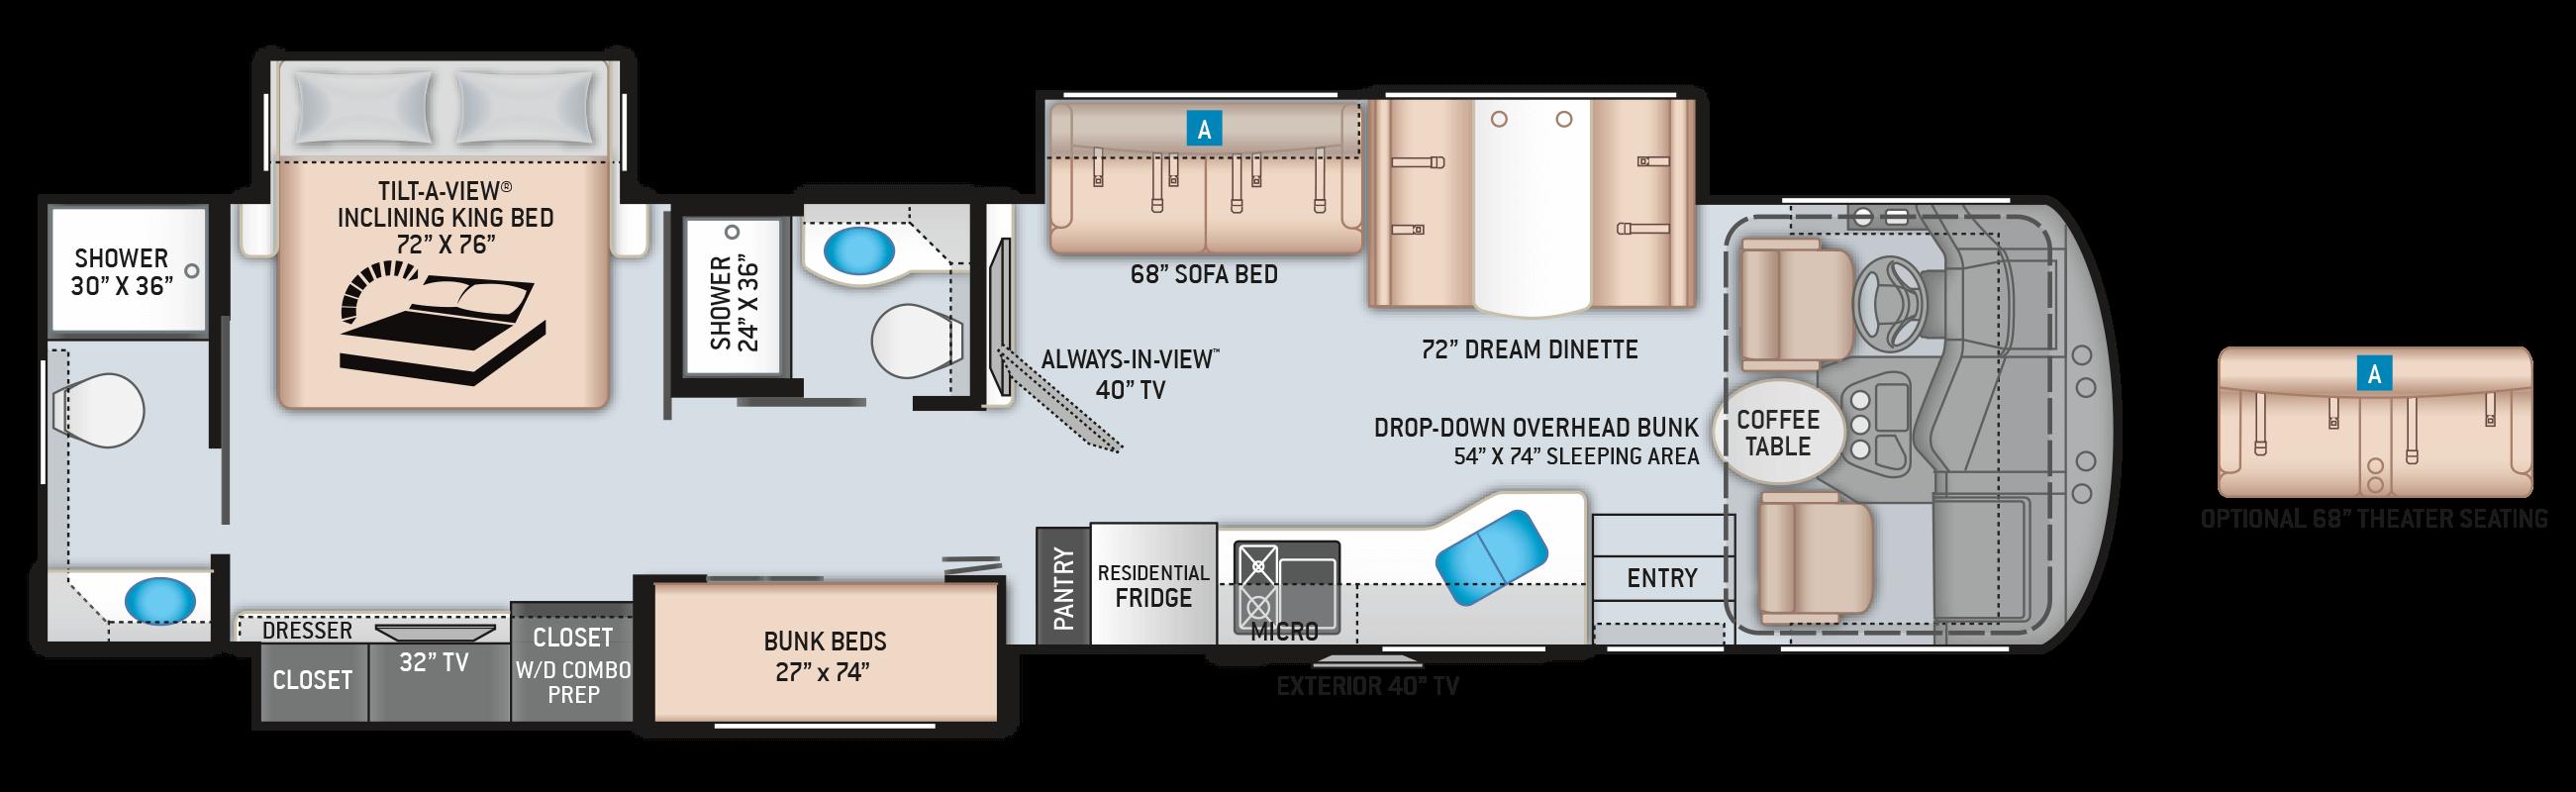 Miramar 37.1 Floor Plan